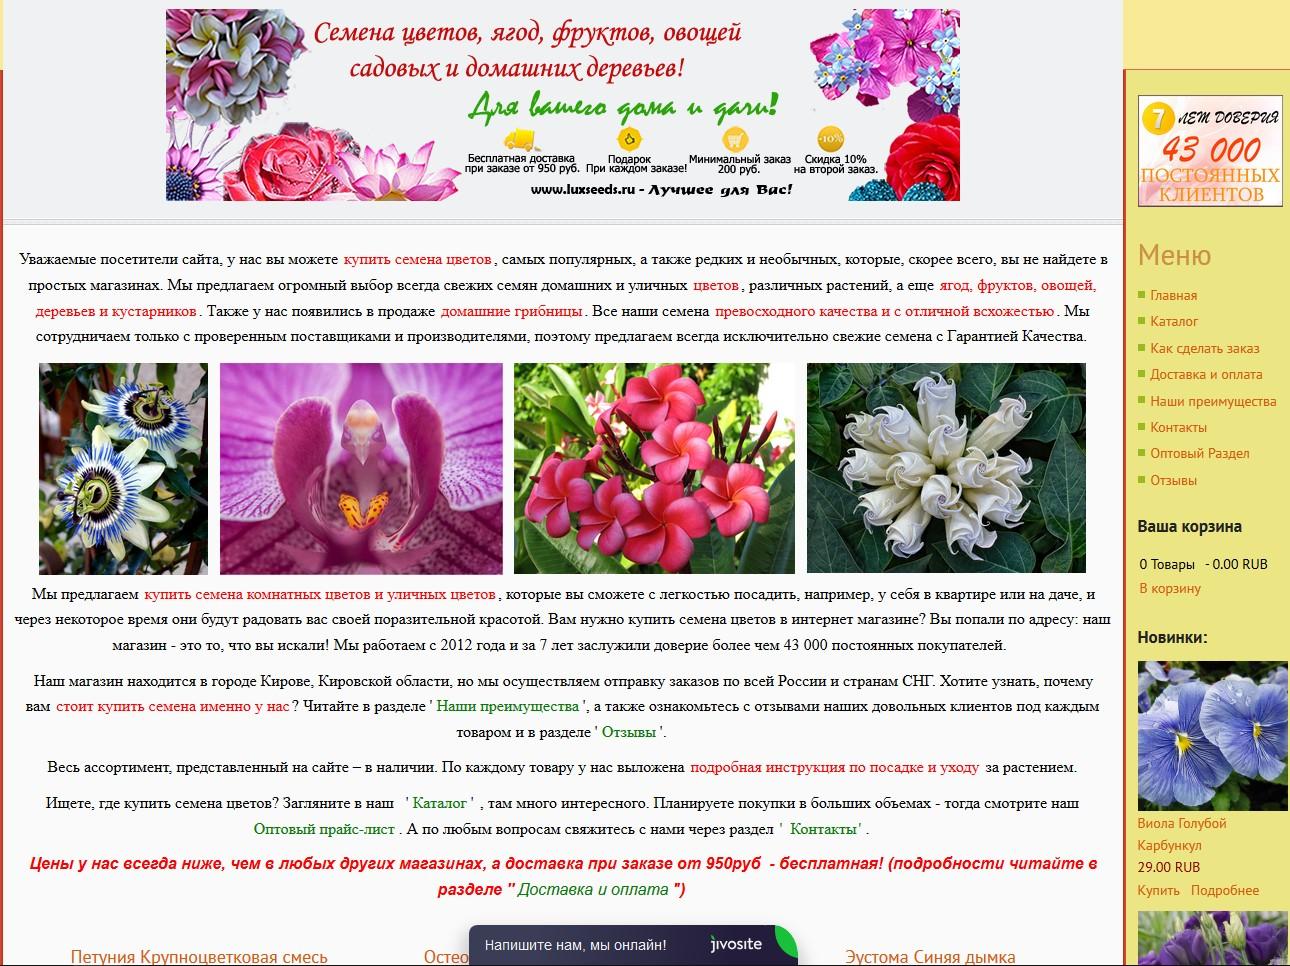 Скриншот интернет-магазина luxseeds.ru